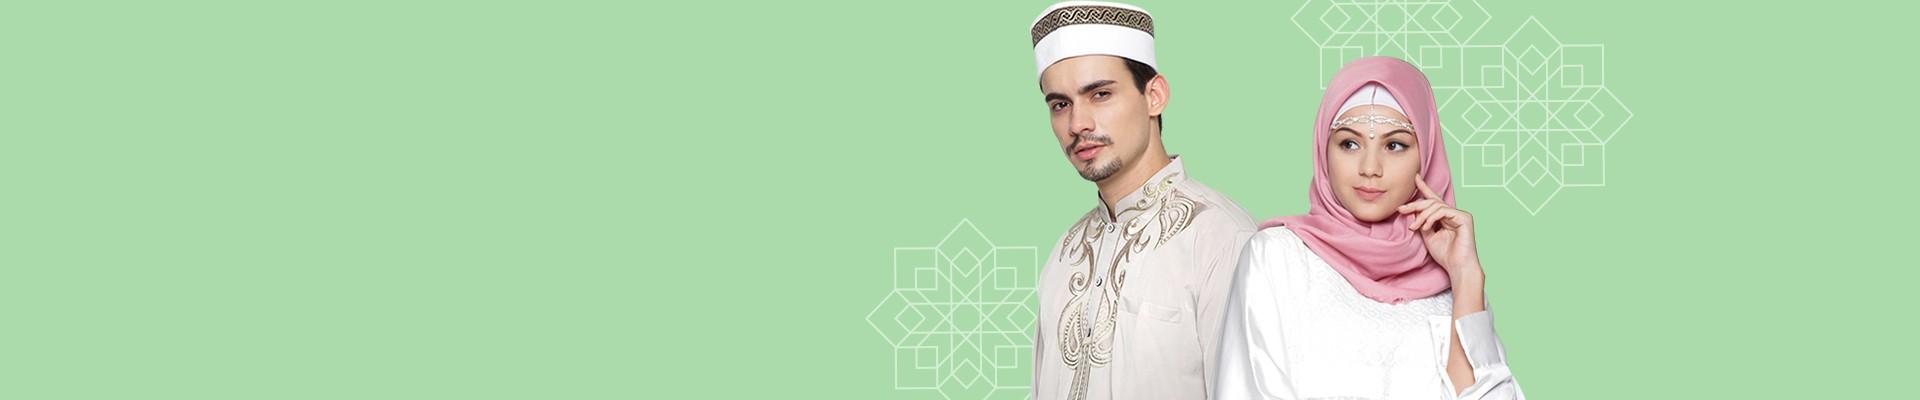 Fashion Muslim - Jual Fashion Muslim Terbaru Koleksi Lebaran